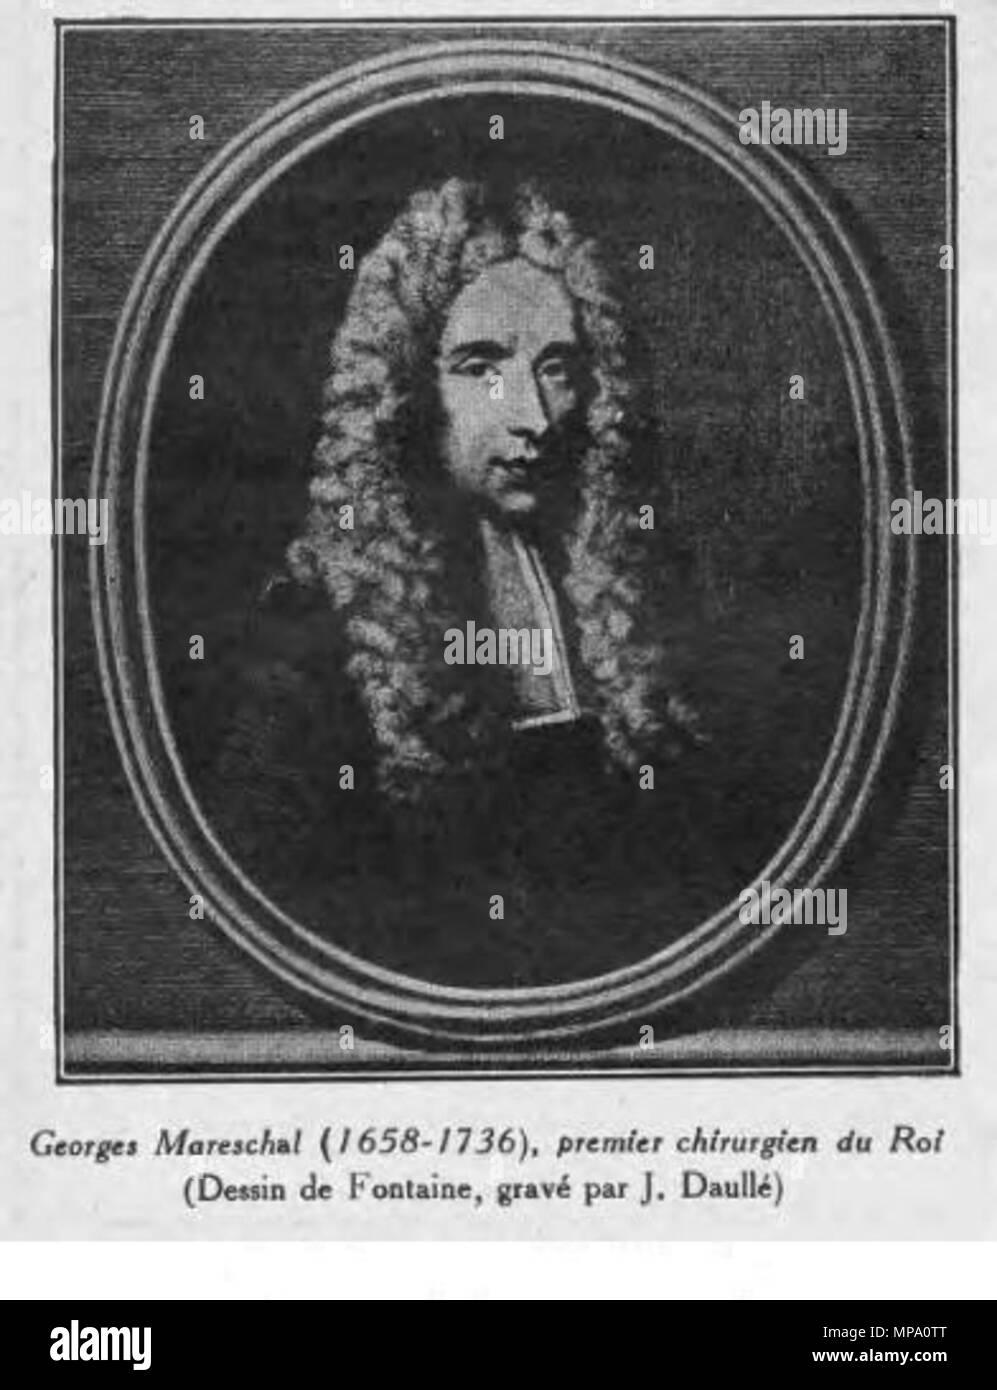 . Georges Mareschal (1658-1736) premier chirurgien du Roi . 18th century.   855 Georges Marechal - Stock Image